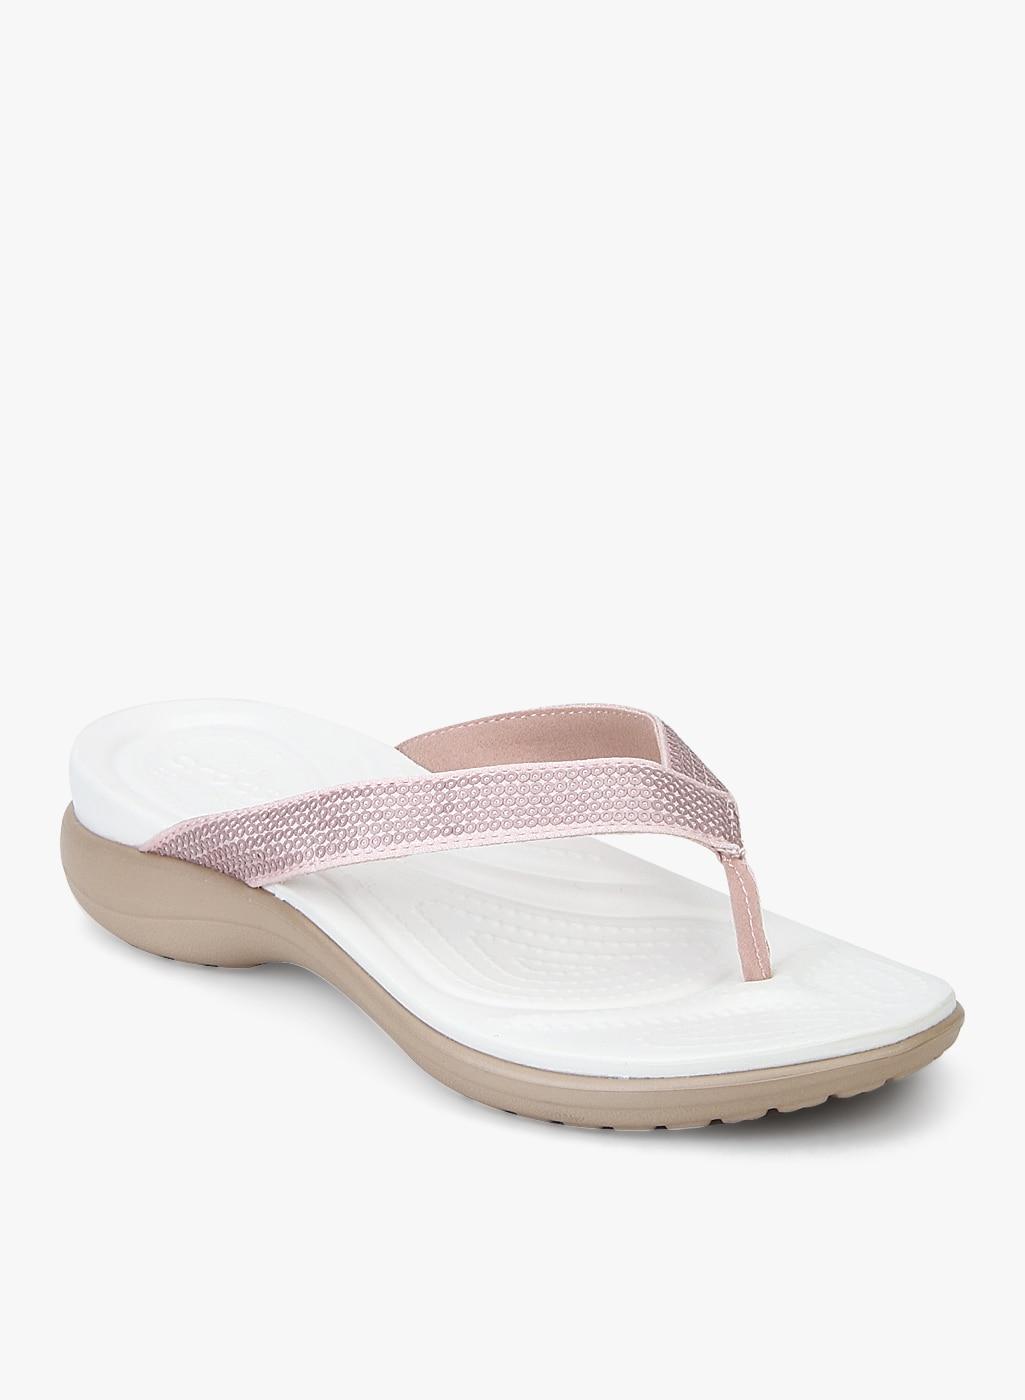 e4418b1bdebc Crocs Capri V Sequin W Peach Flip Flops for women - Get stylish ...